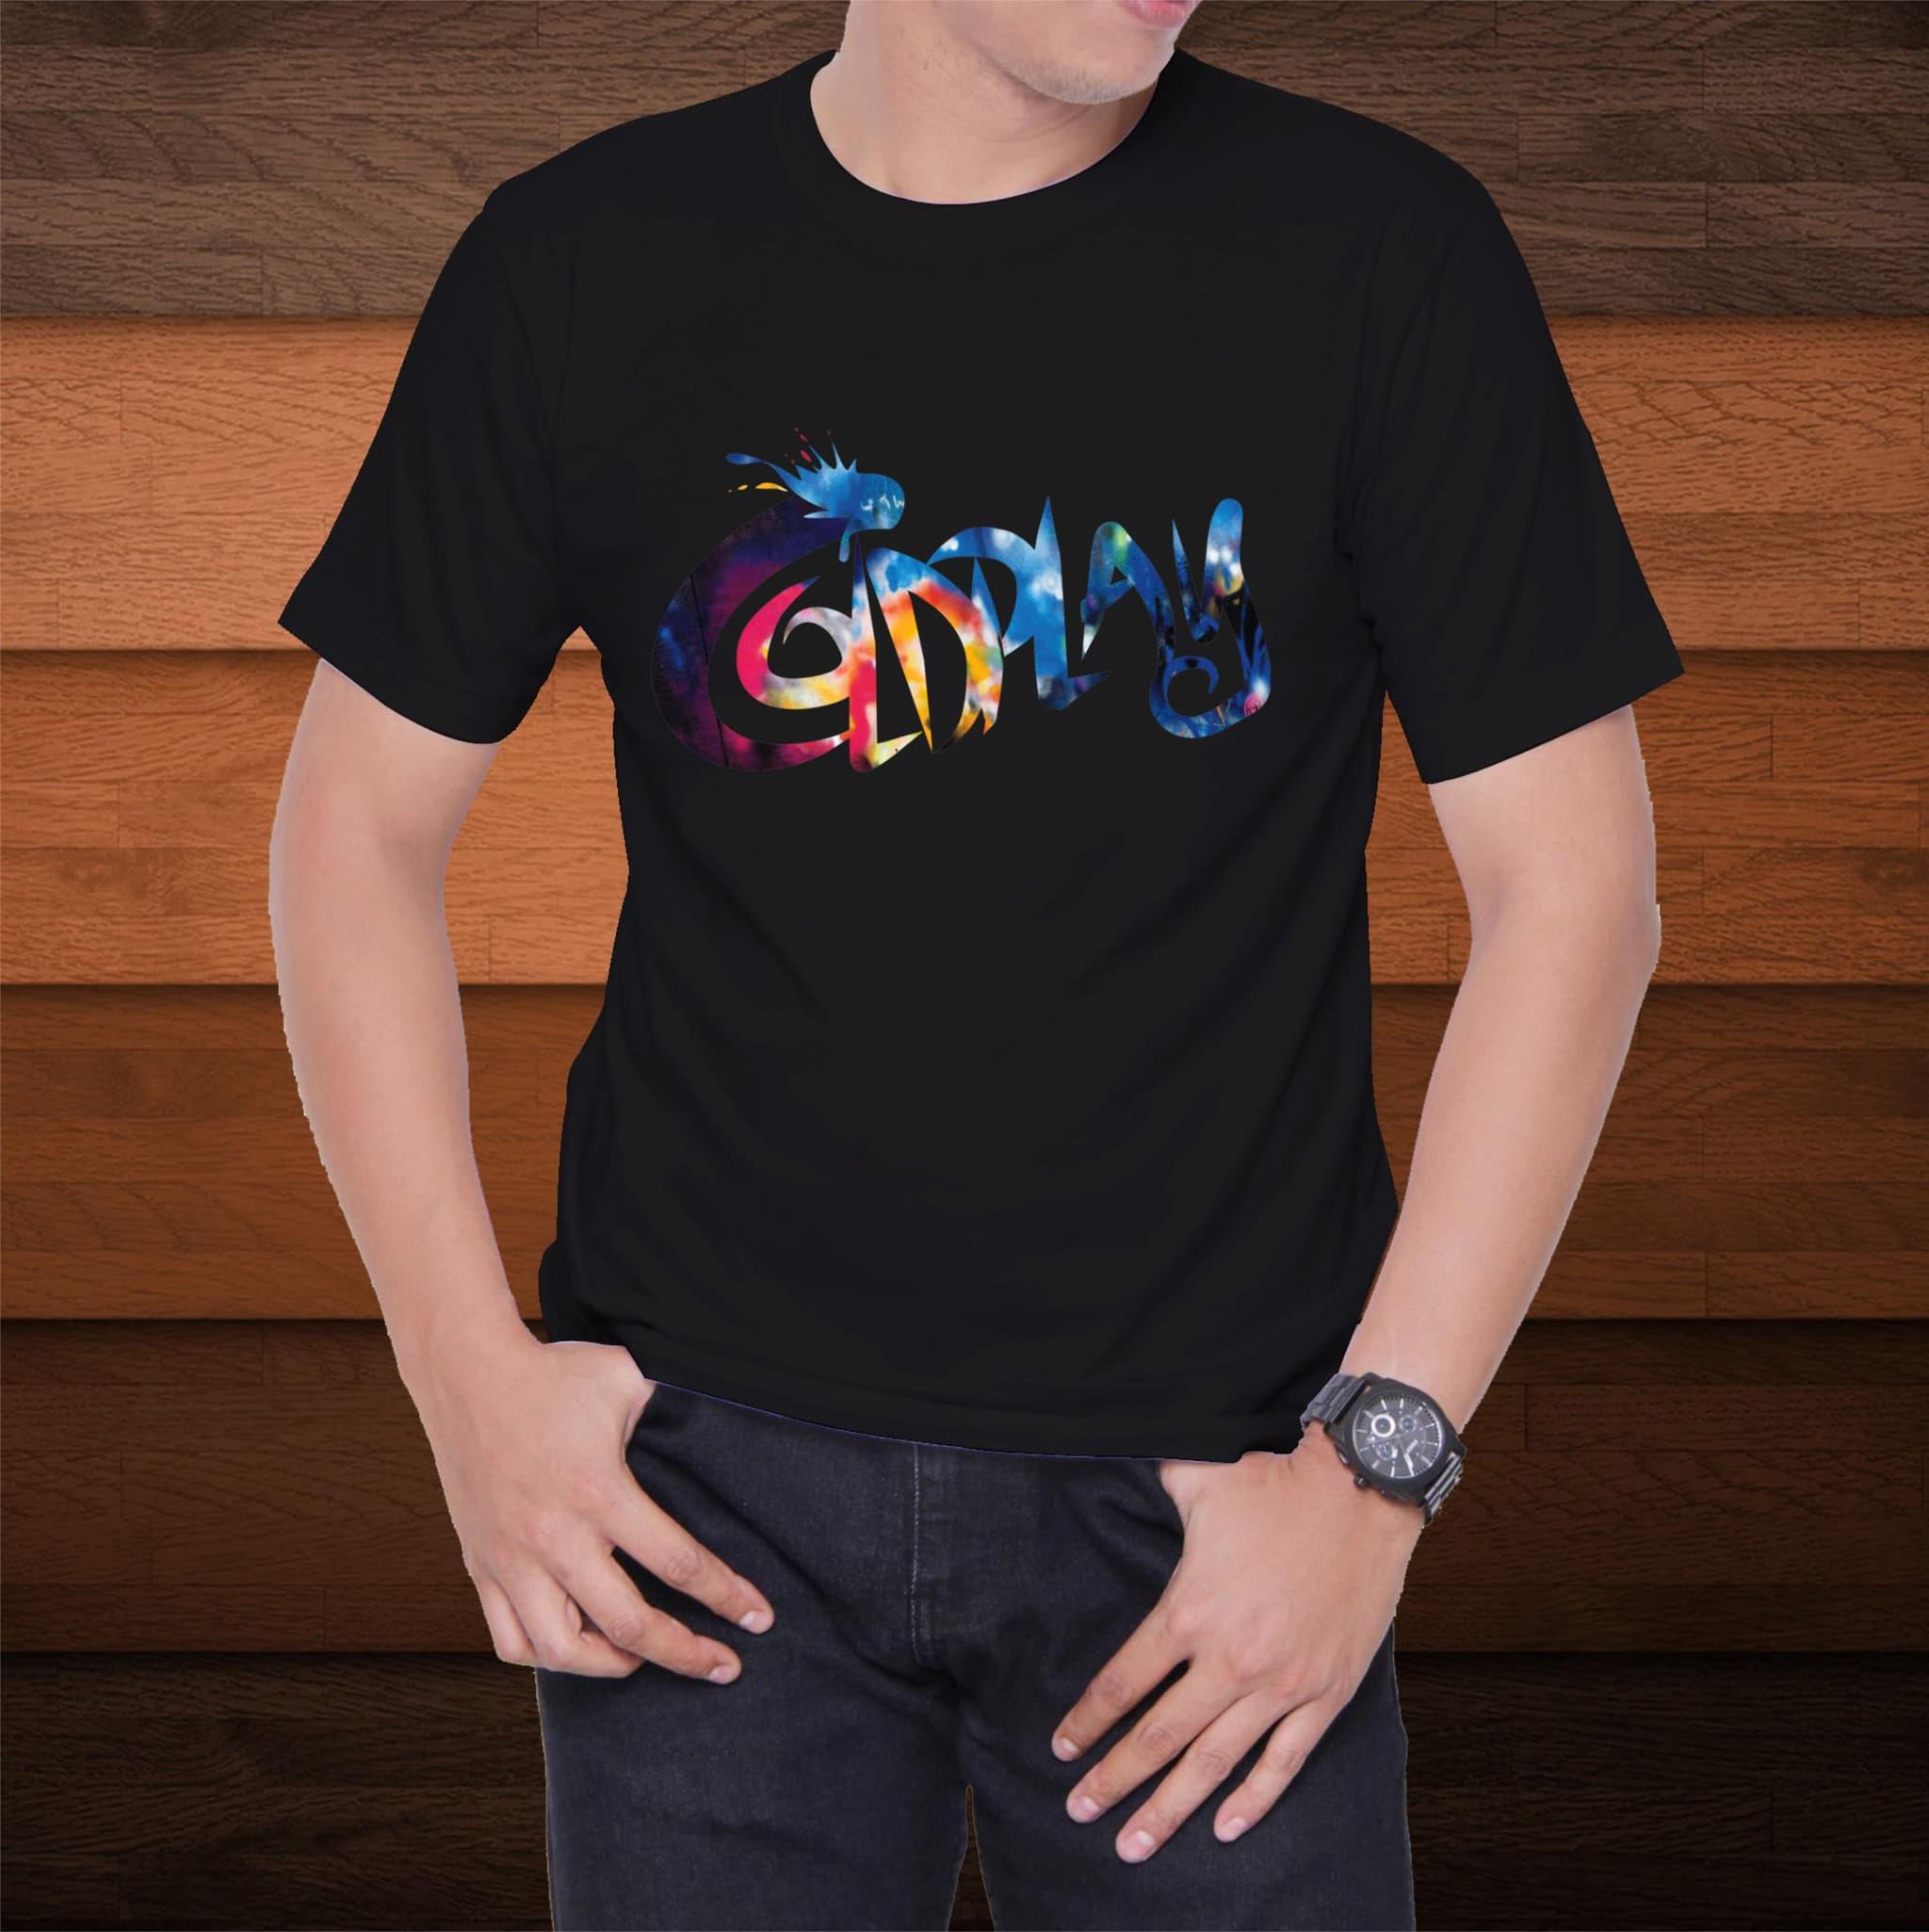 PENAWARAN Kaos Distro T-Shirt coldplay W6165 Ukuran M 78588b2fb8